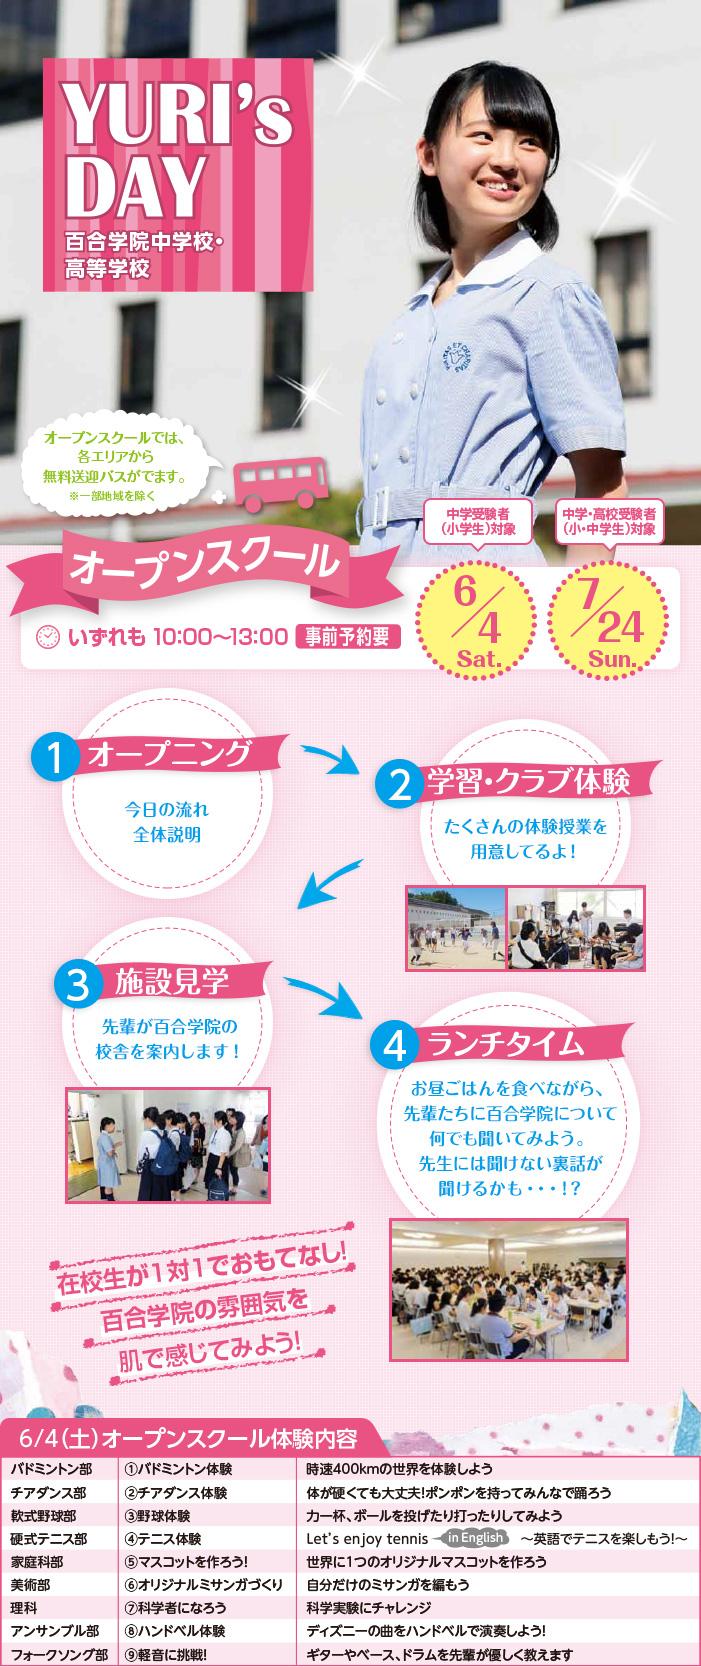 http://jrhigh.yuri-gakuin.ac.jp/wp-content/uploads/sites/3/2016/05/openschool.jpg